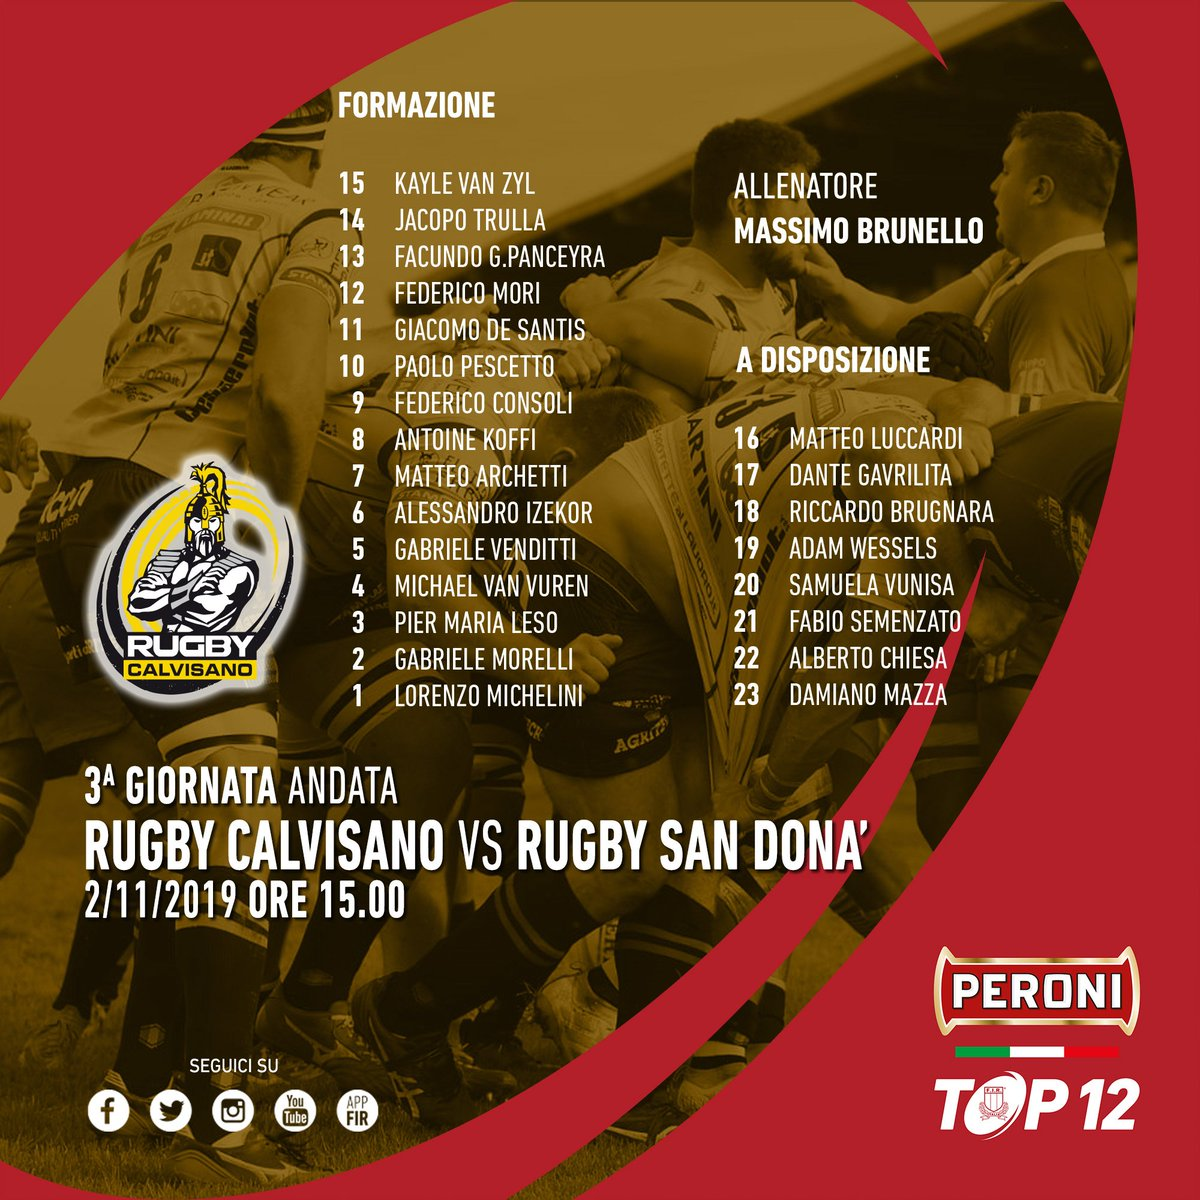 🔴 #PeroniTOP12, il @RugbyCalvisano schiera 4 new millennials contro il @rugbysandona ➡ tinyurl.com/y4hnasr8 #CALvSDN #rugbypassioneitaliana